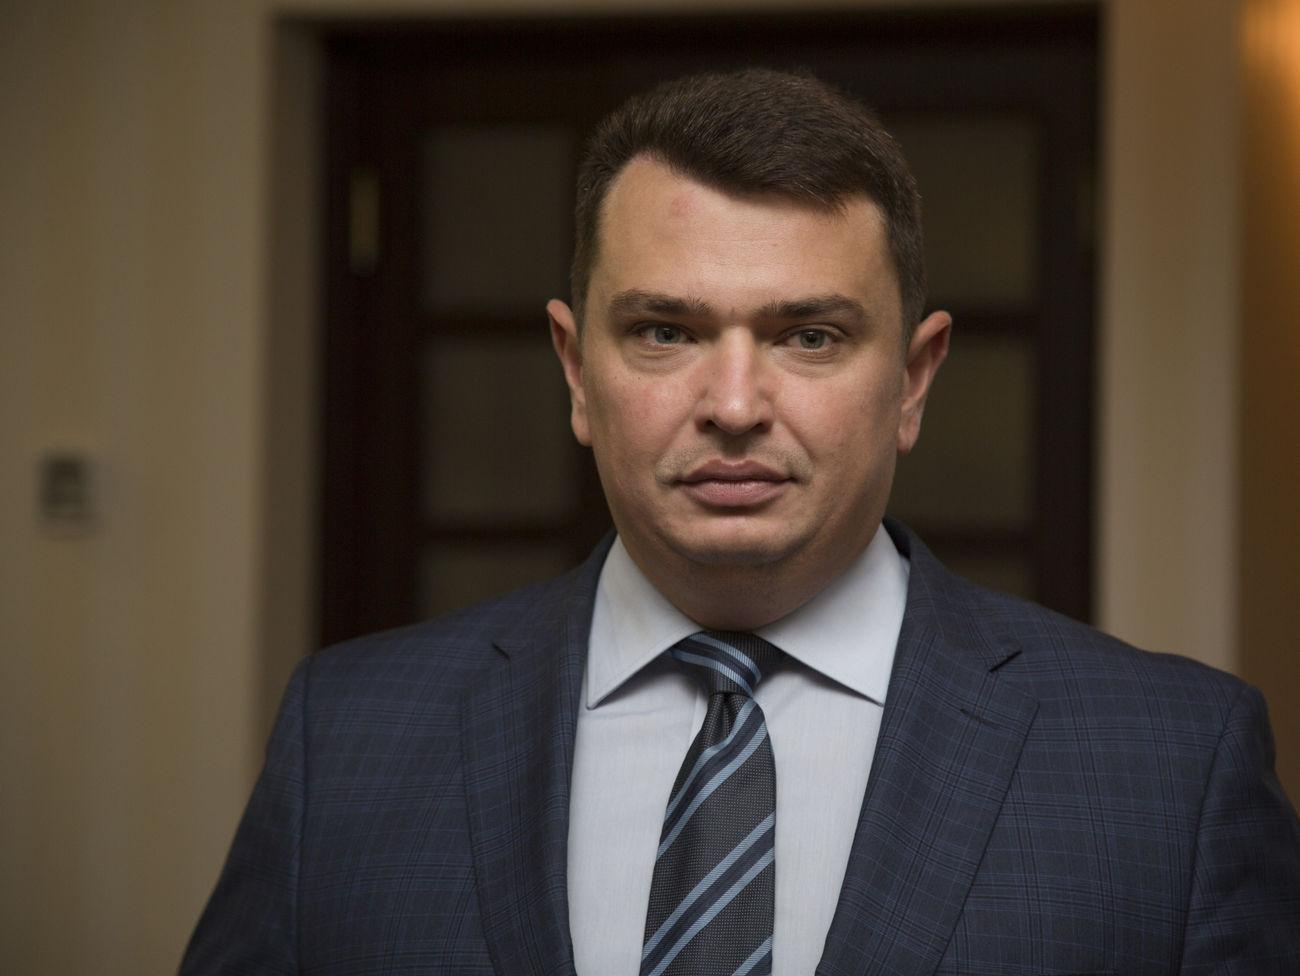 Сарган: Директору НАБУ на трассе зачитали протокол о коррупции, дело п